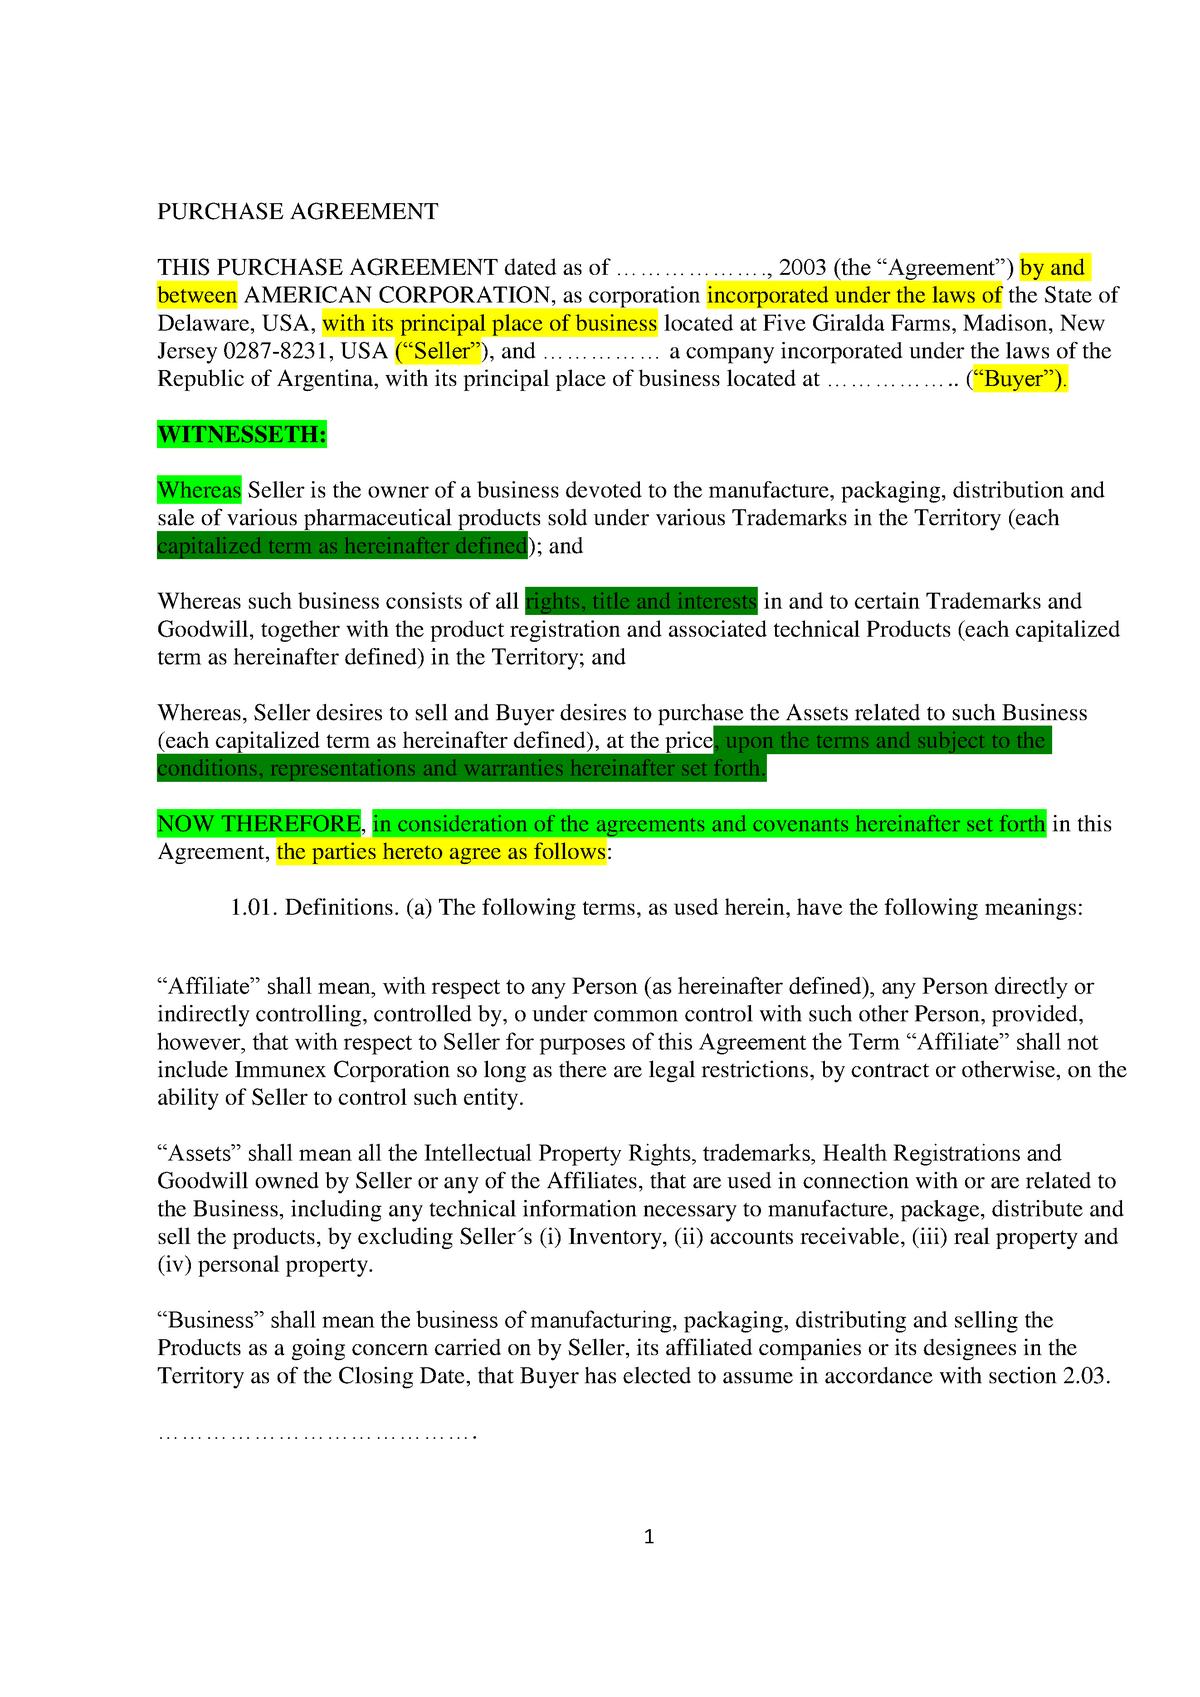 Purchase Agreement Source - Práctica Profesional B - StuDocu